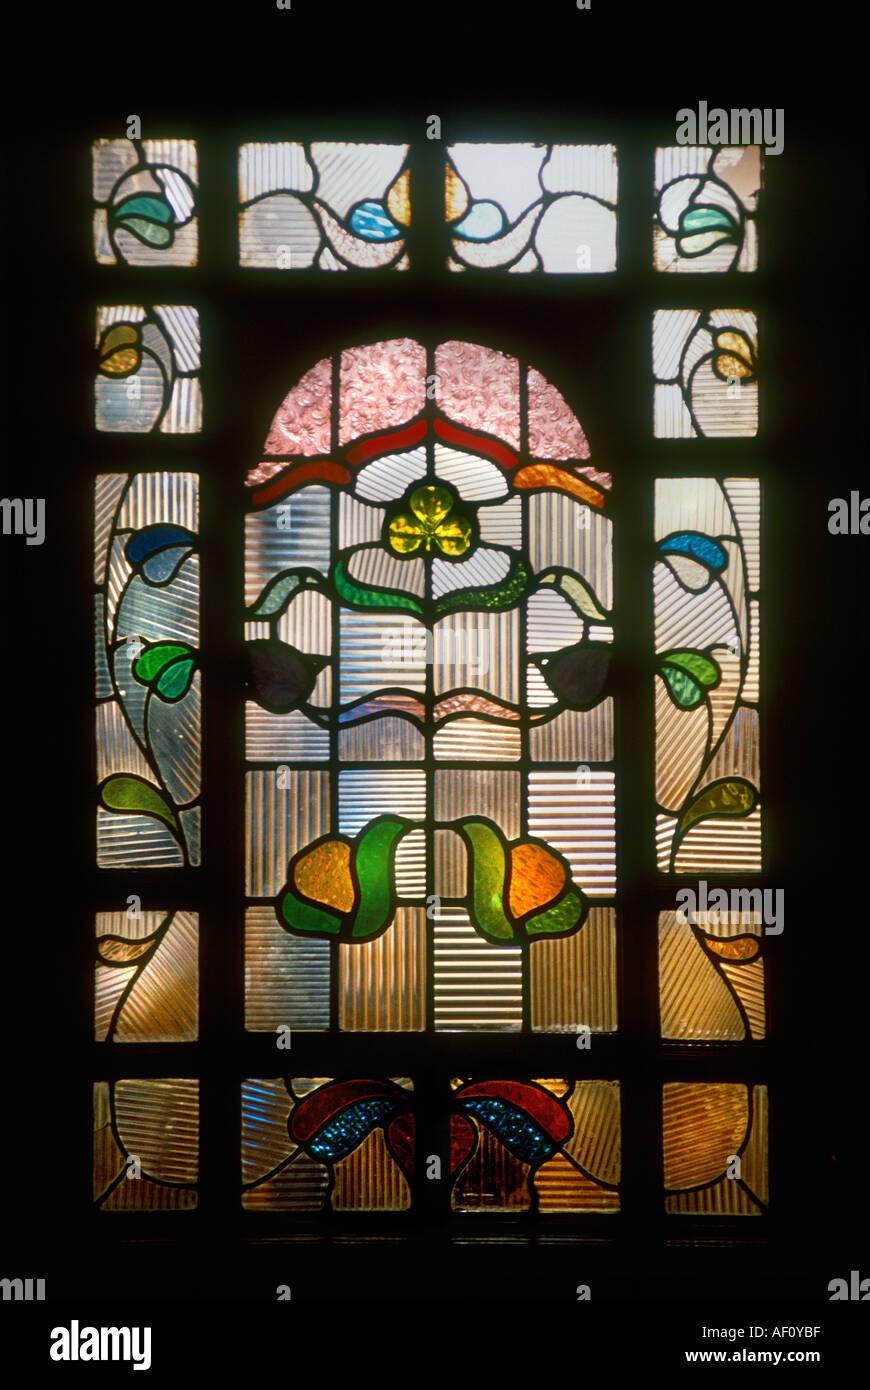 Close up front door panel of decorative stained glass in the art close up front door panel of decorative stained glass in the art nouveau style british housing london rubansaba